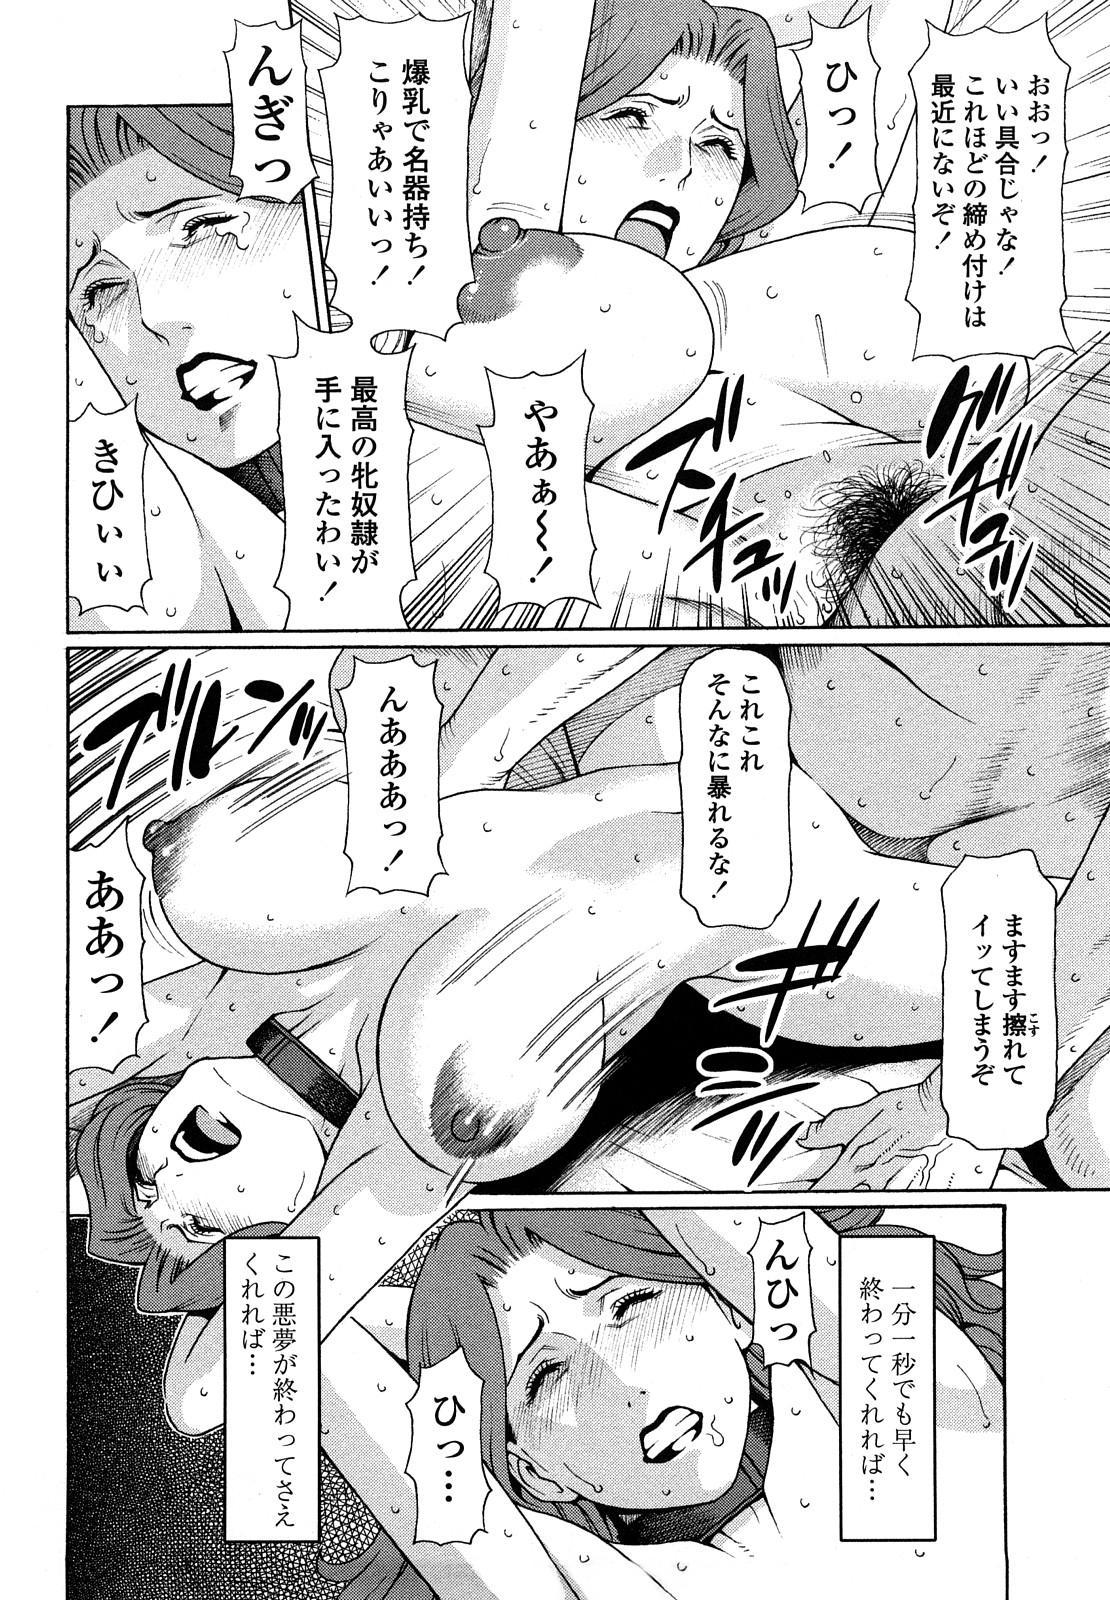 [Takasugi Kou] Kindan no Haha-Ana - Immorality Love-Hole [Decensored] 99